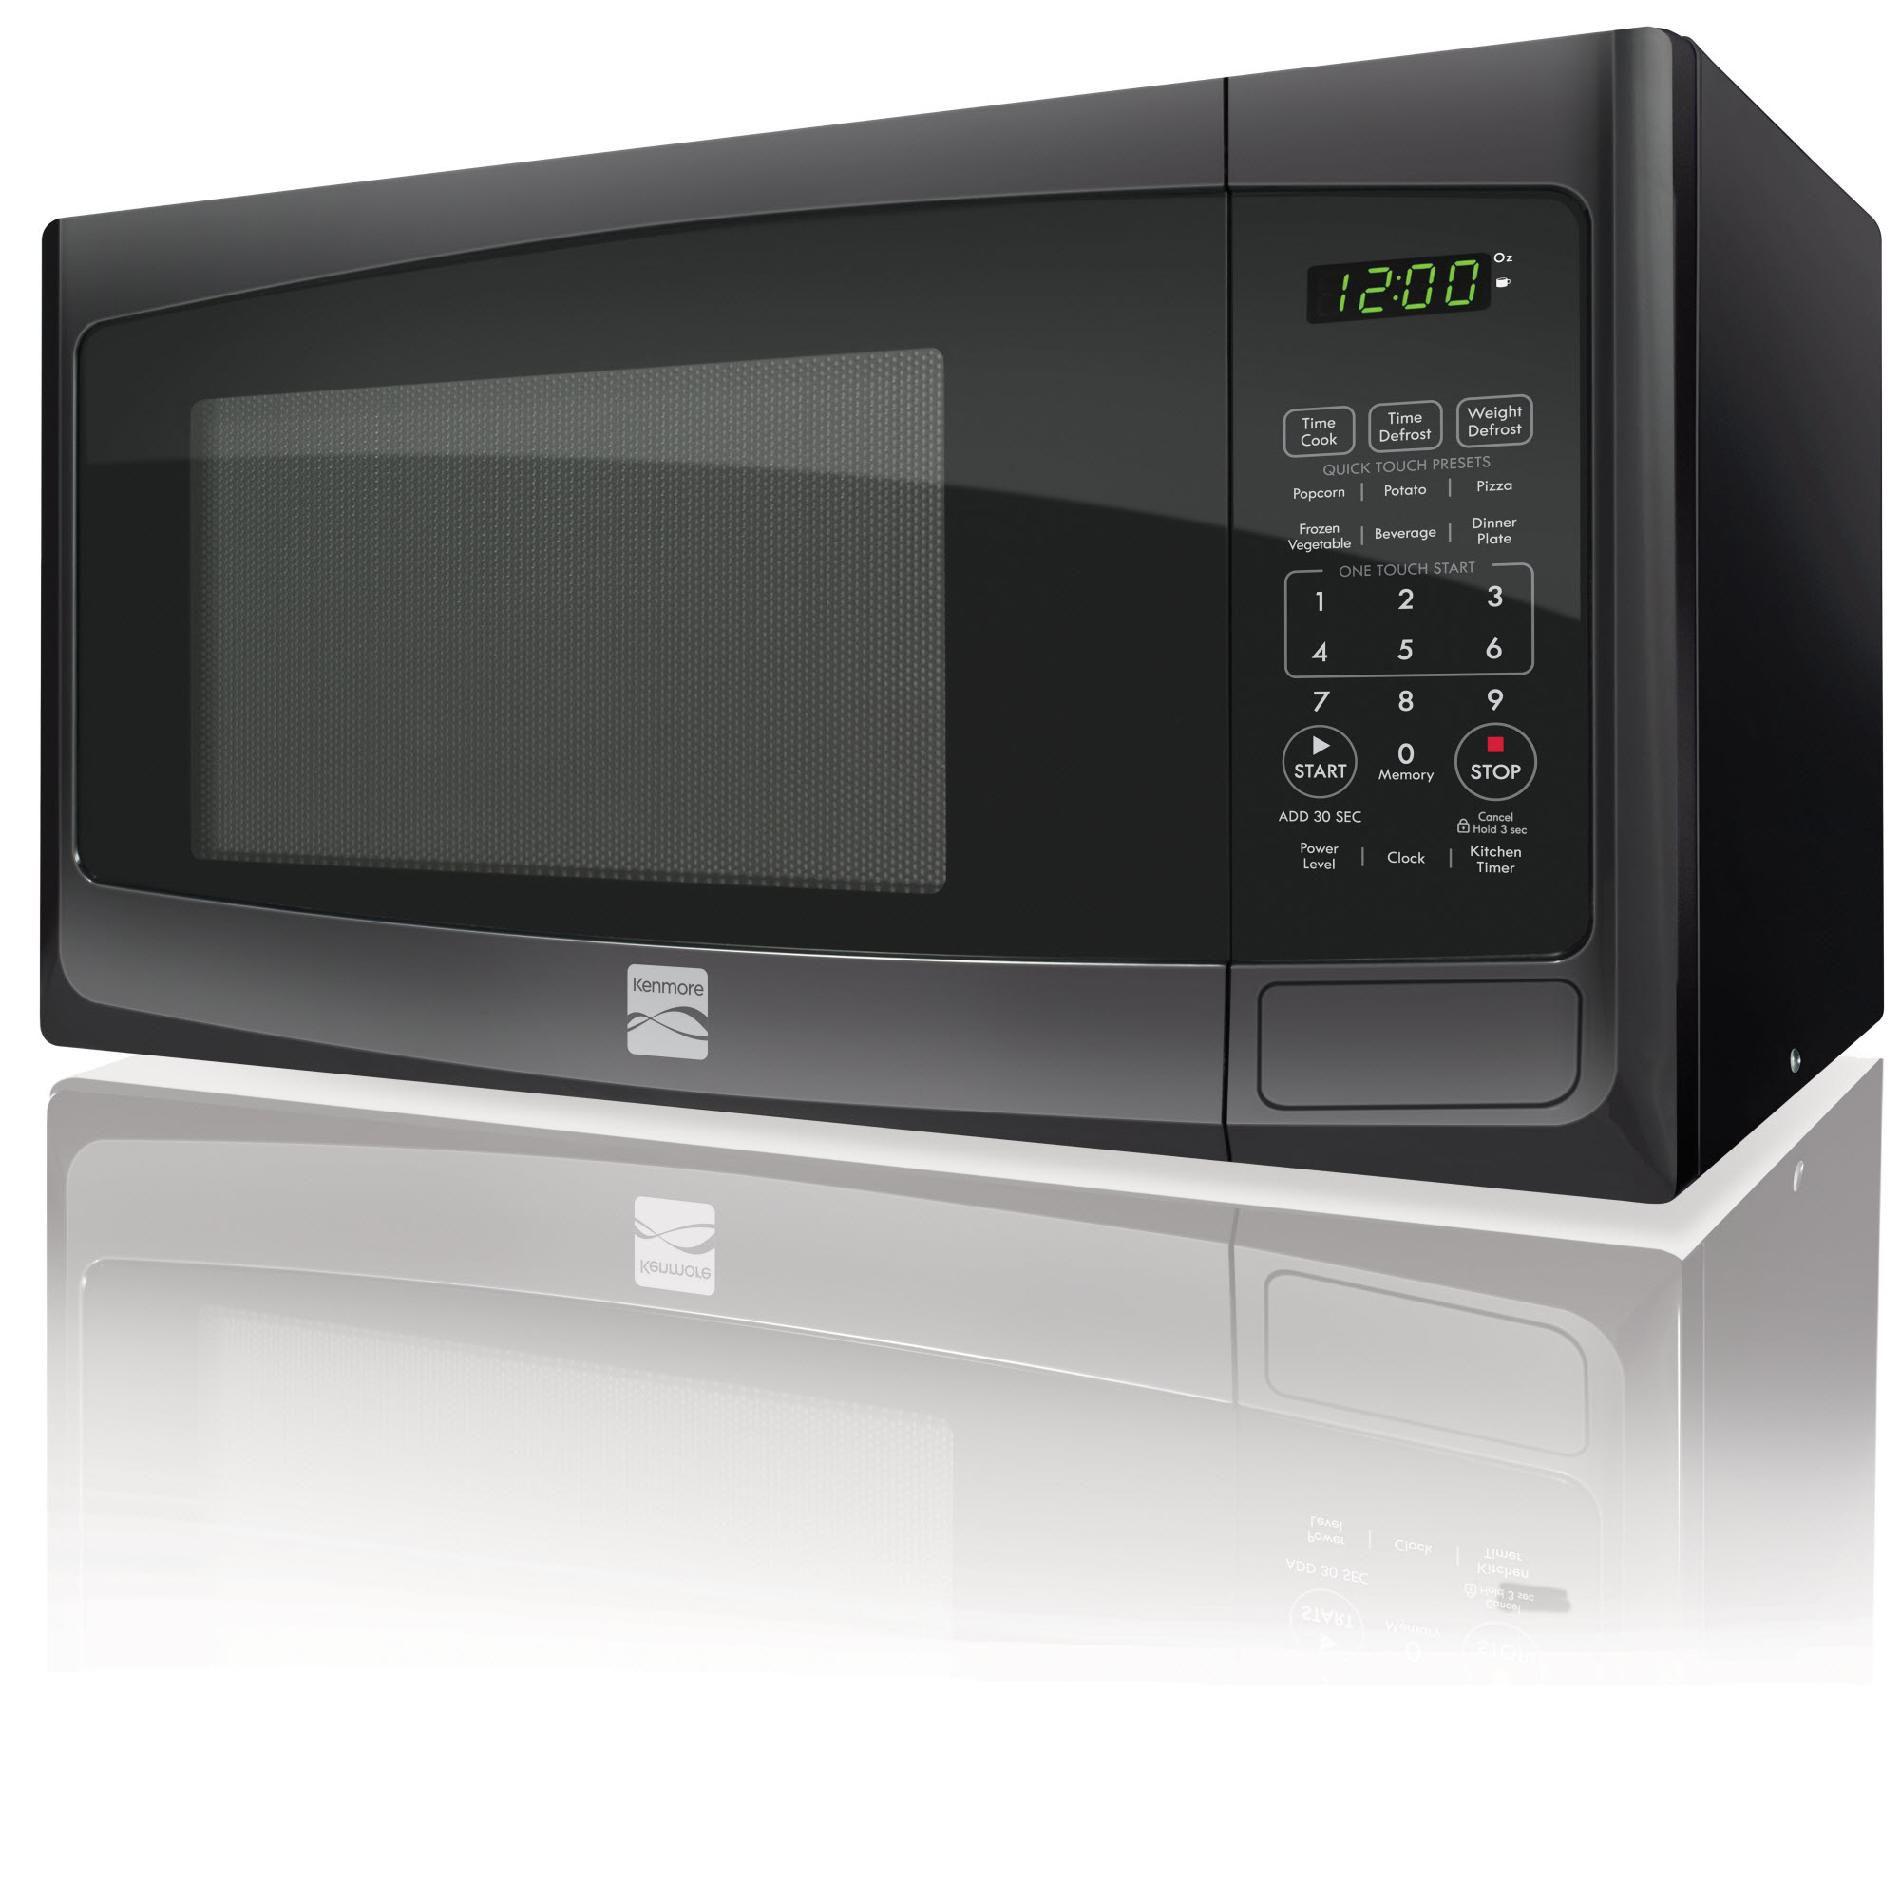 Kenmore 73099 0.9 Cu. Ft. Countertop Microwave - Black